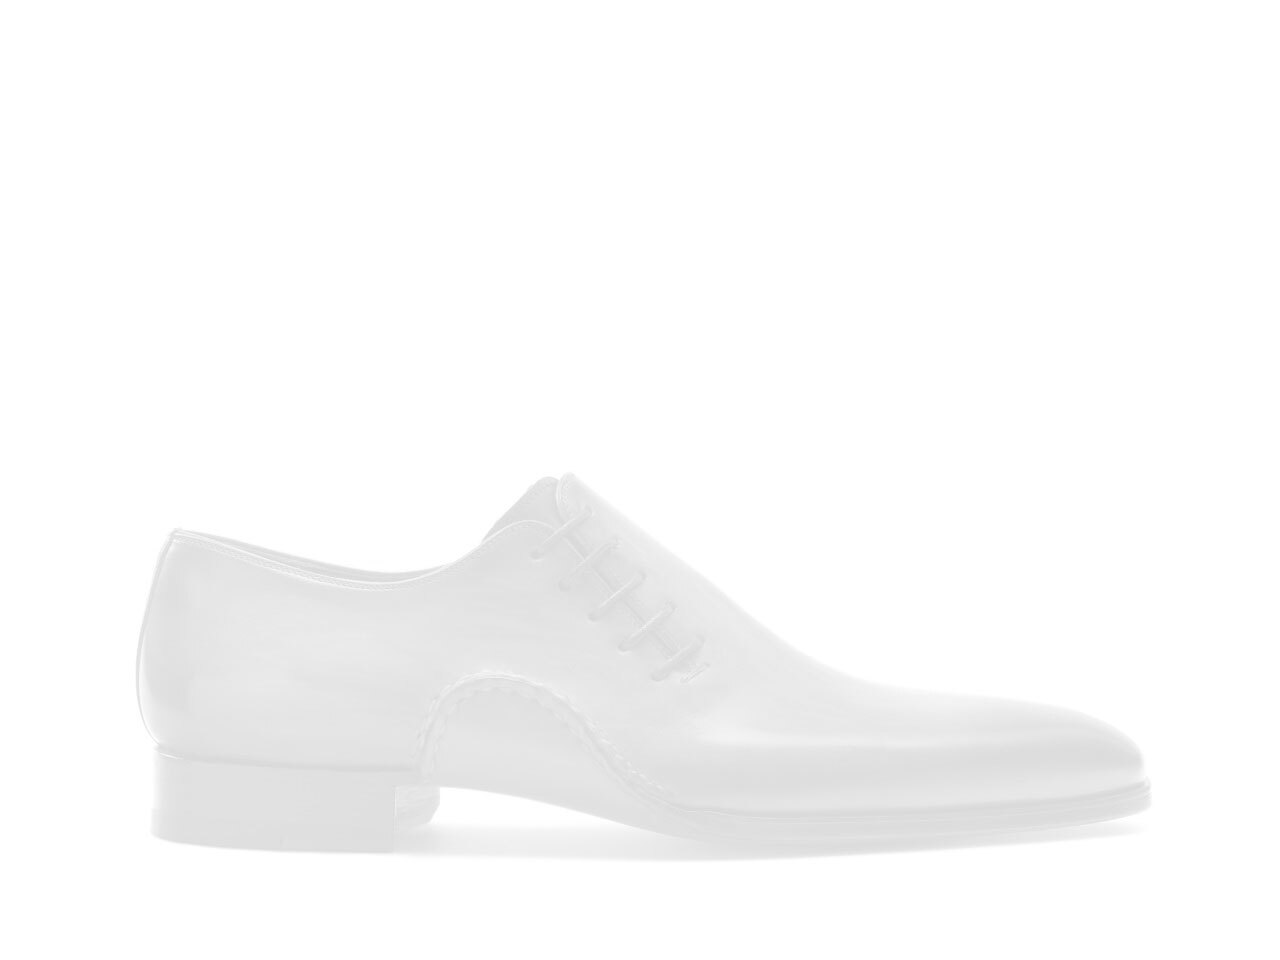 Pair of the Magnanni Coto Lo Cognac Men's Sneakers